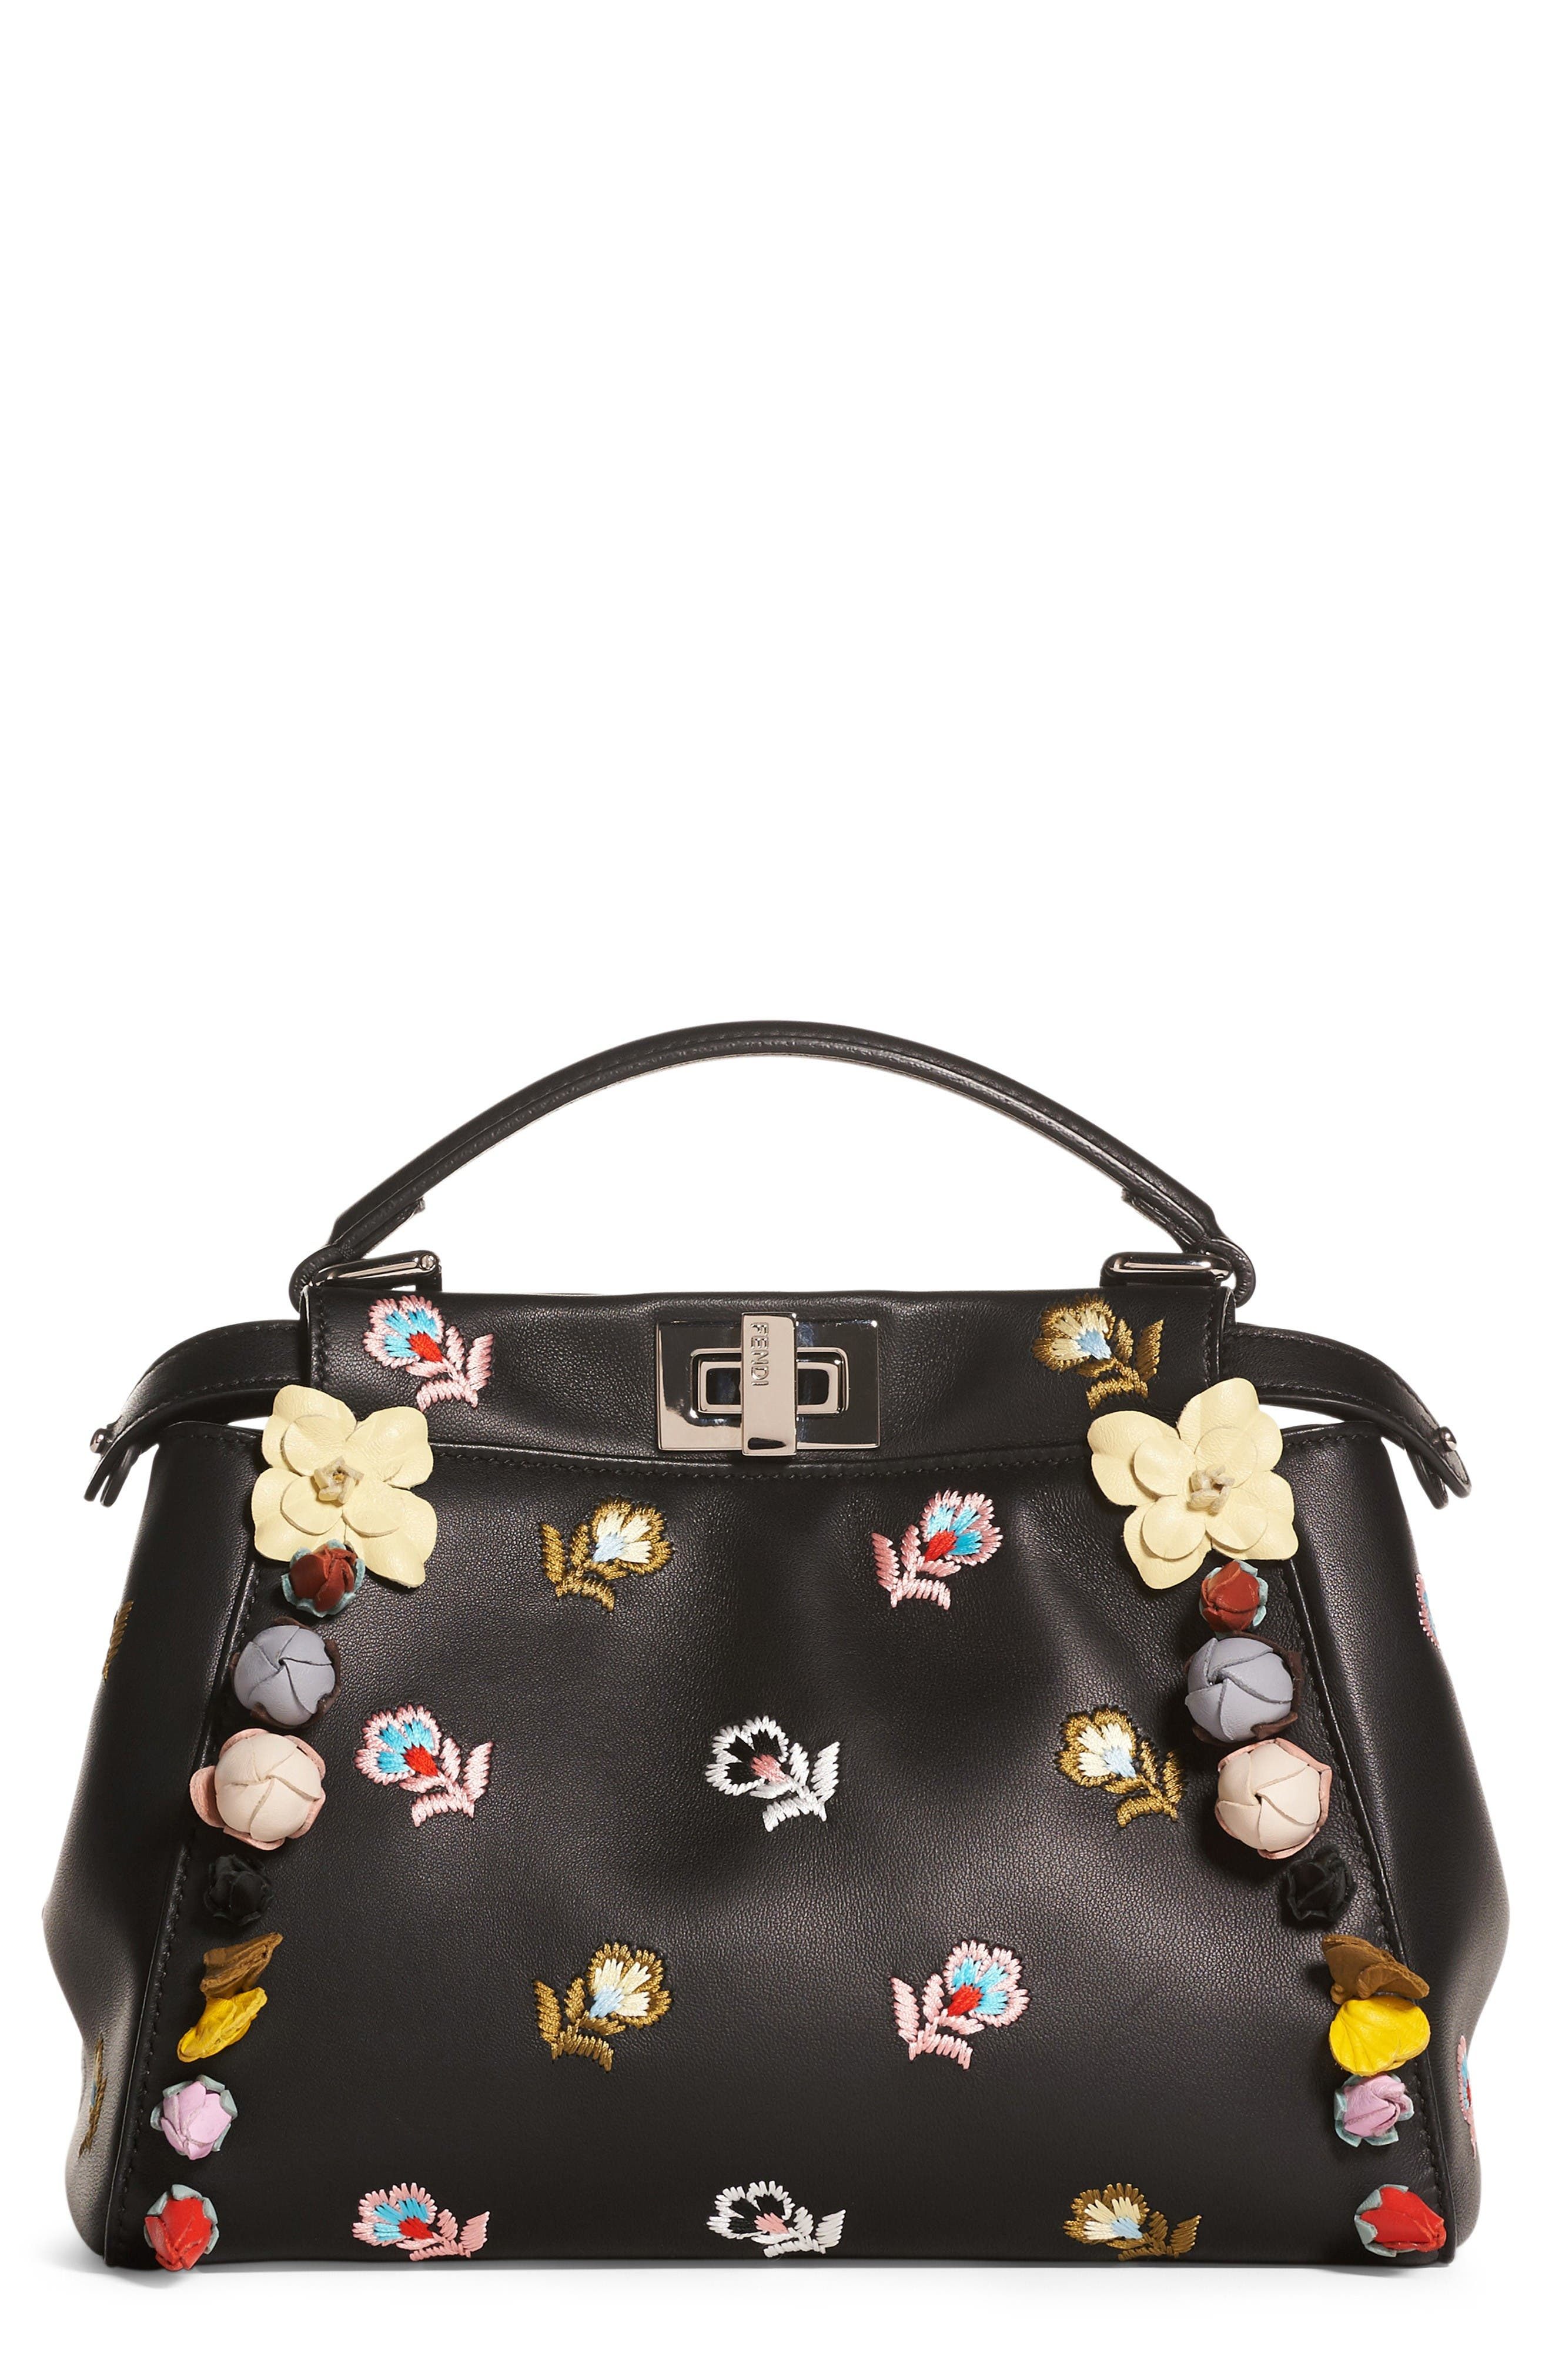 Main Image - Fendi Mini Peekaboo Floral Appliqué Leather Satchel